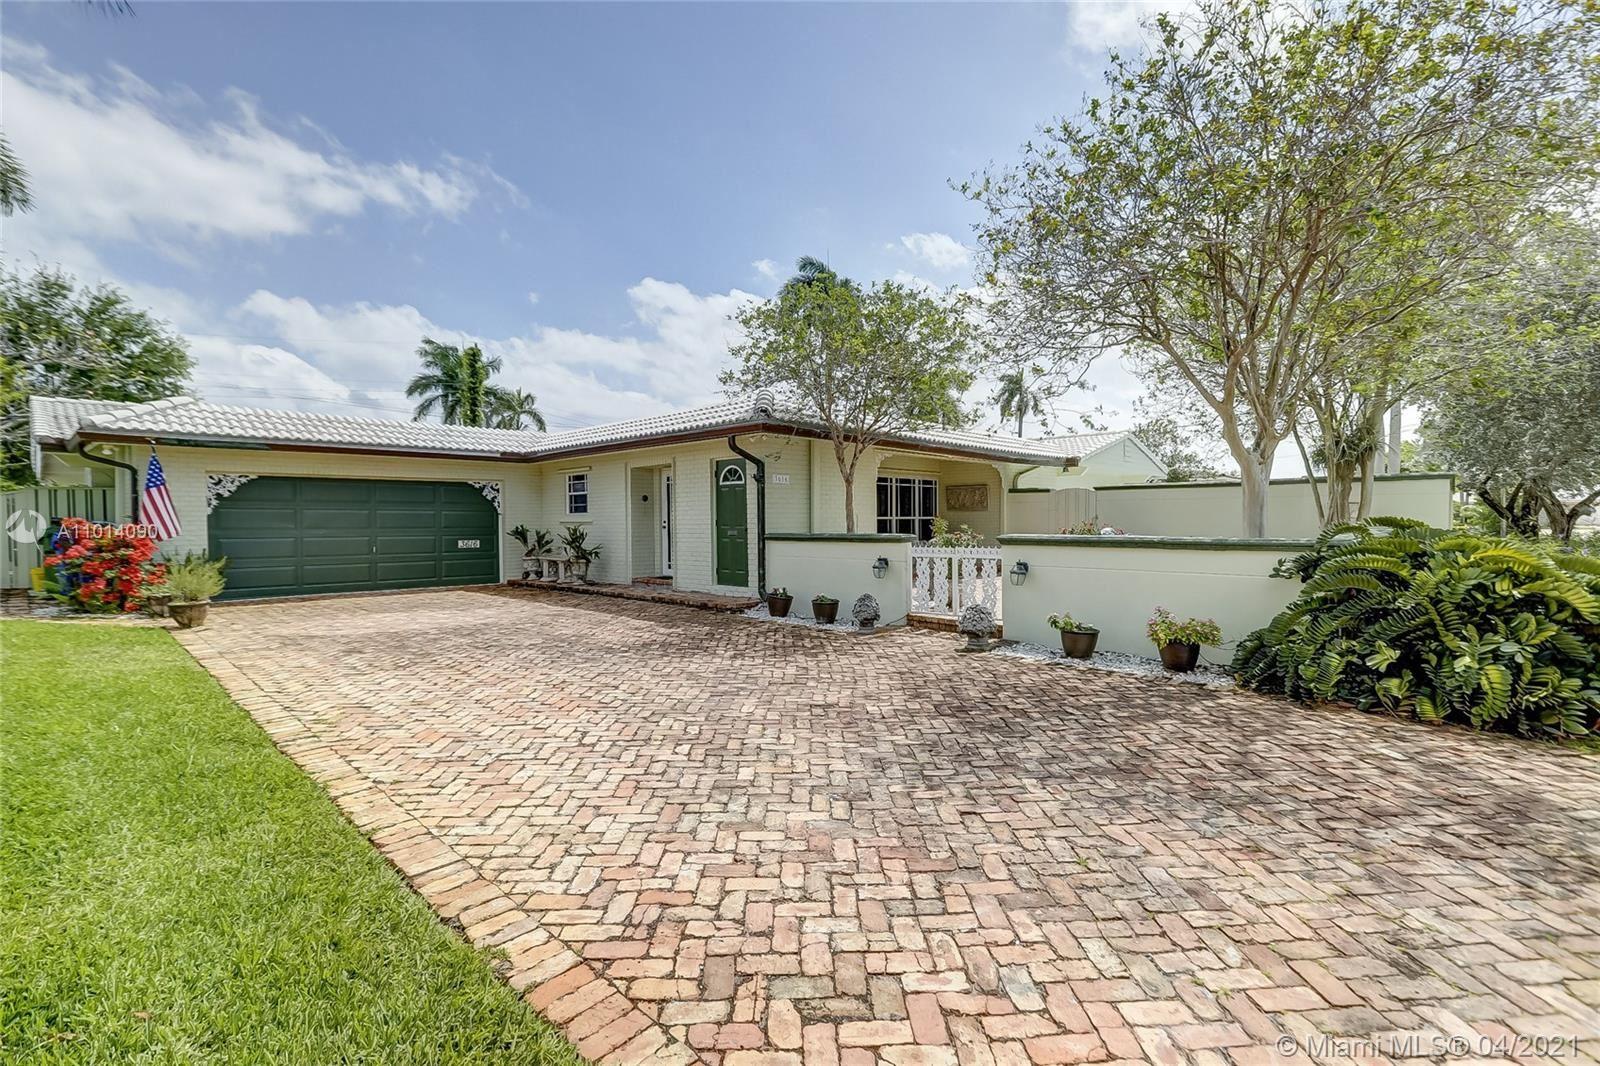 3616 NE 25th Ave, Fort Lauderdale, FL 33308 - #: A11014090